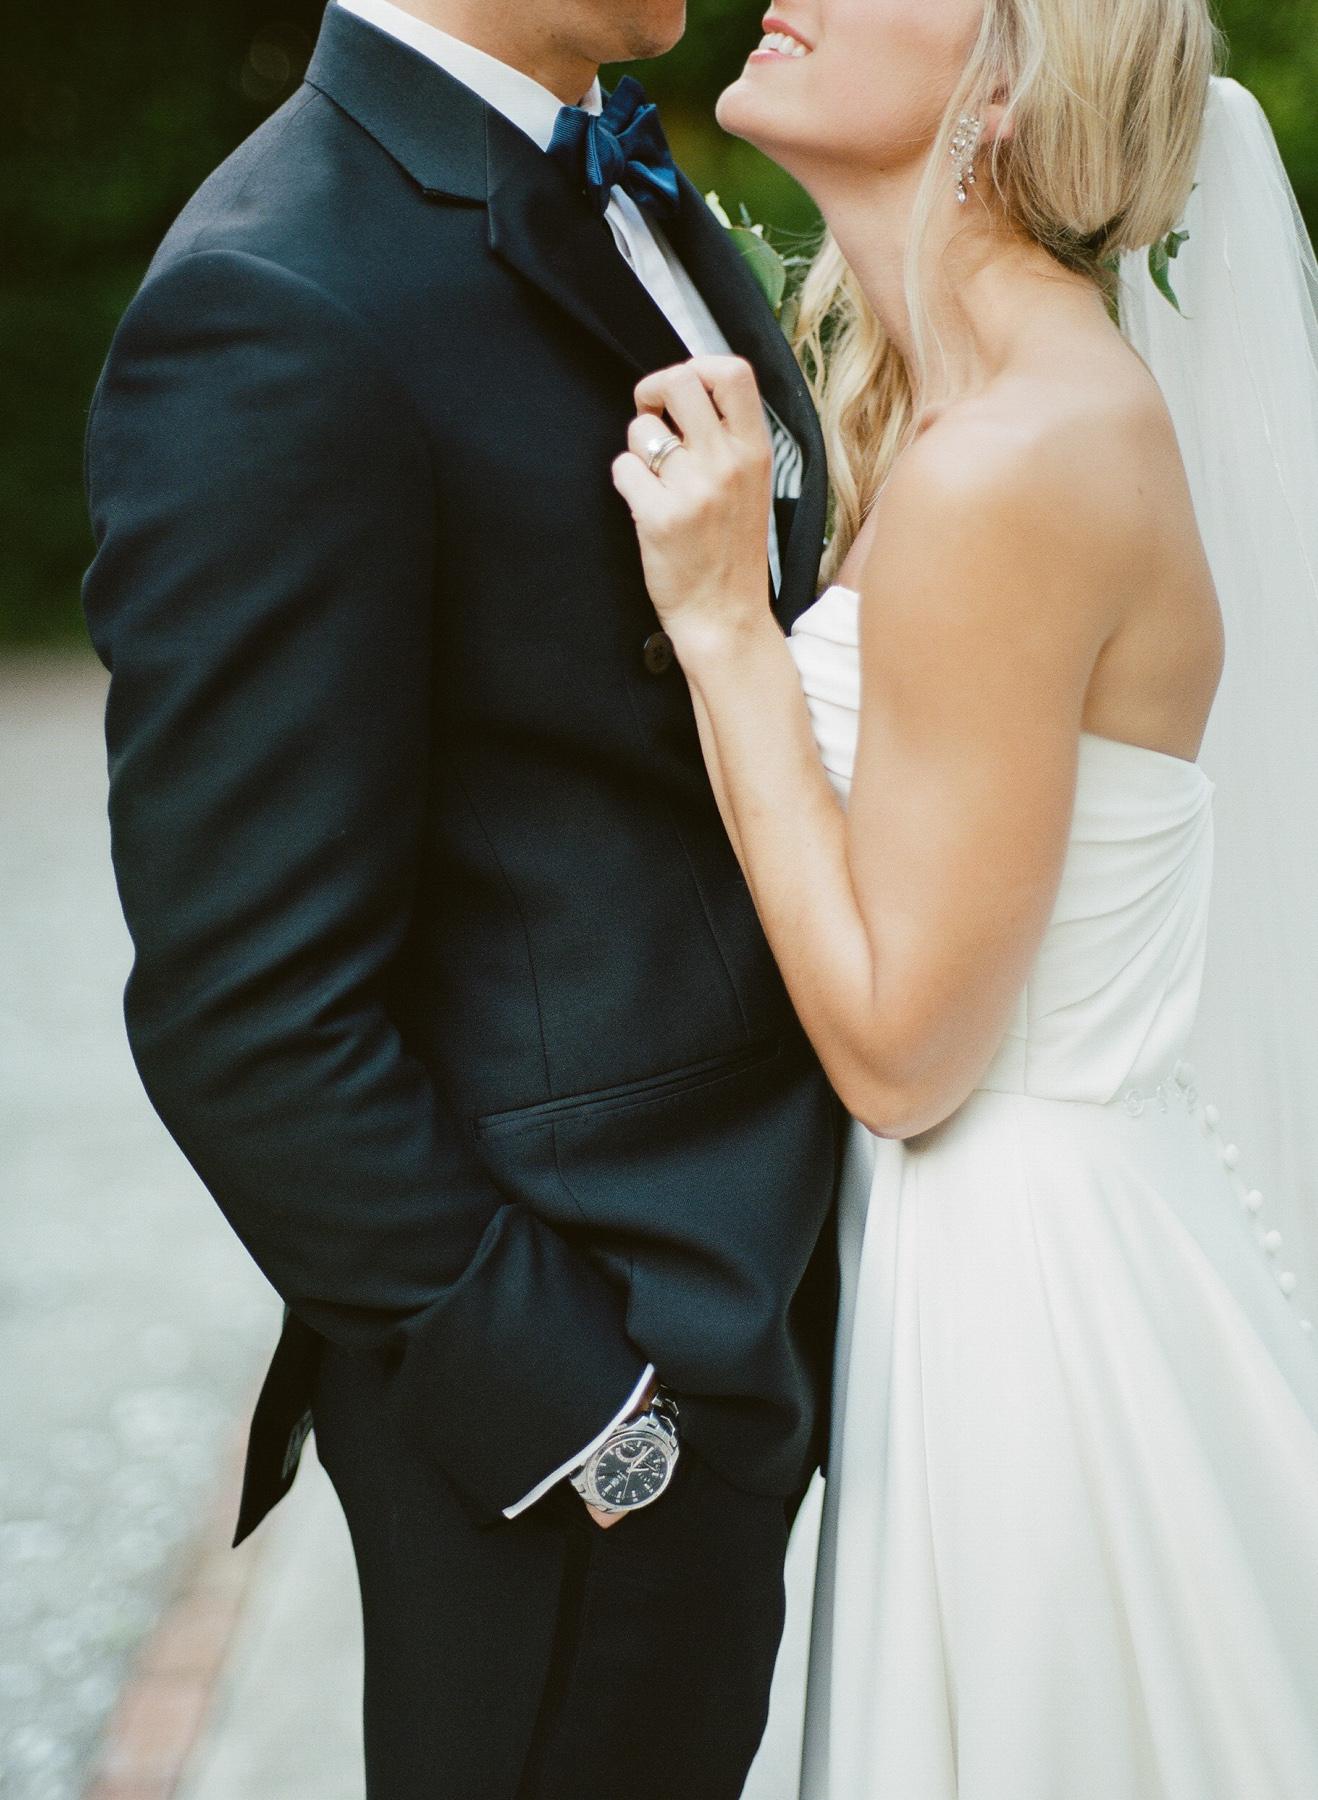 NC-wedding-venues-film-photographer-29.jpg